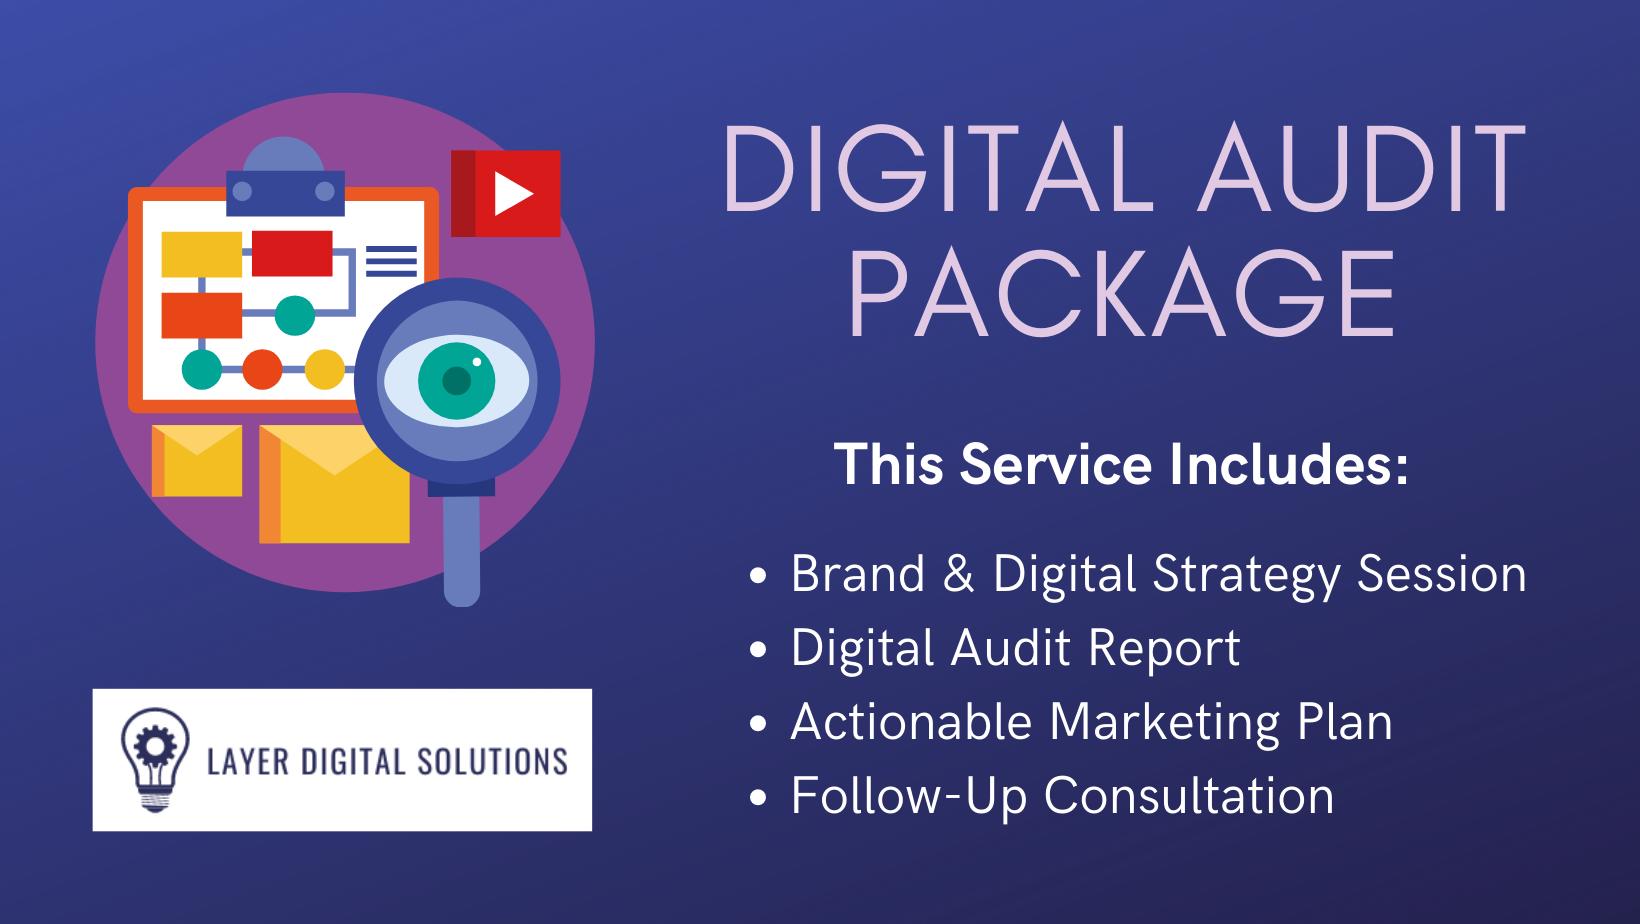 Layer Digital Solutions - Digital Audit